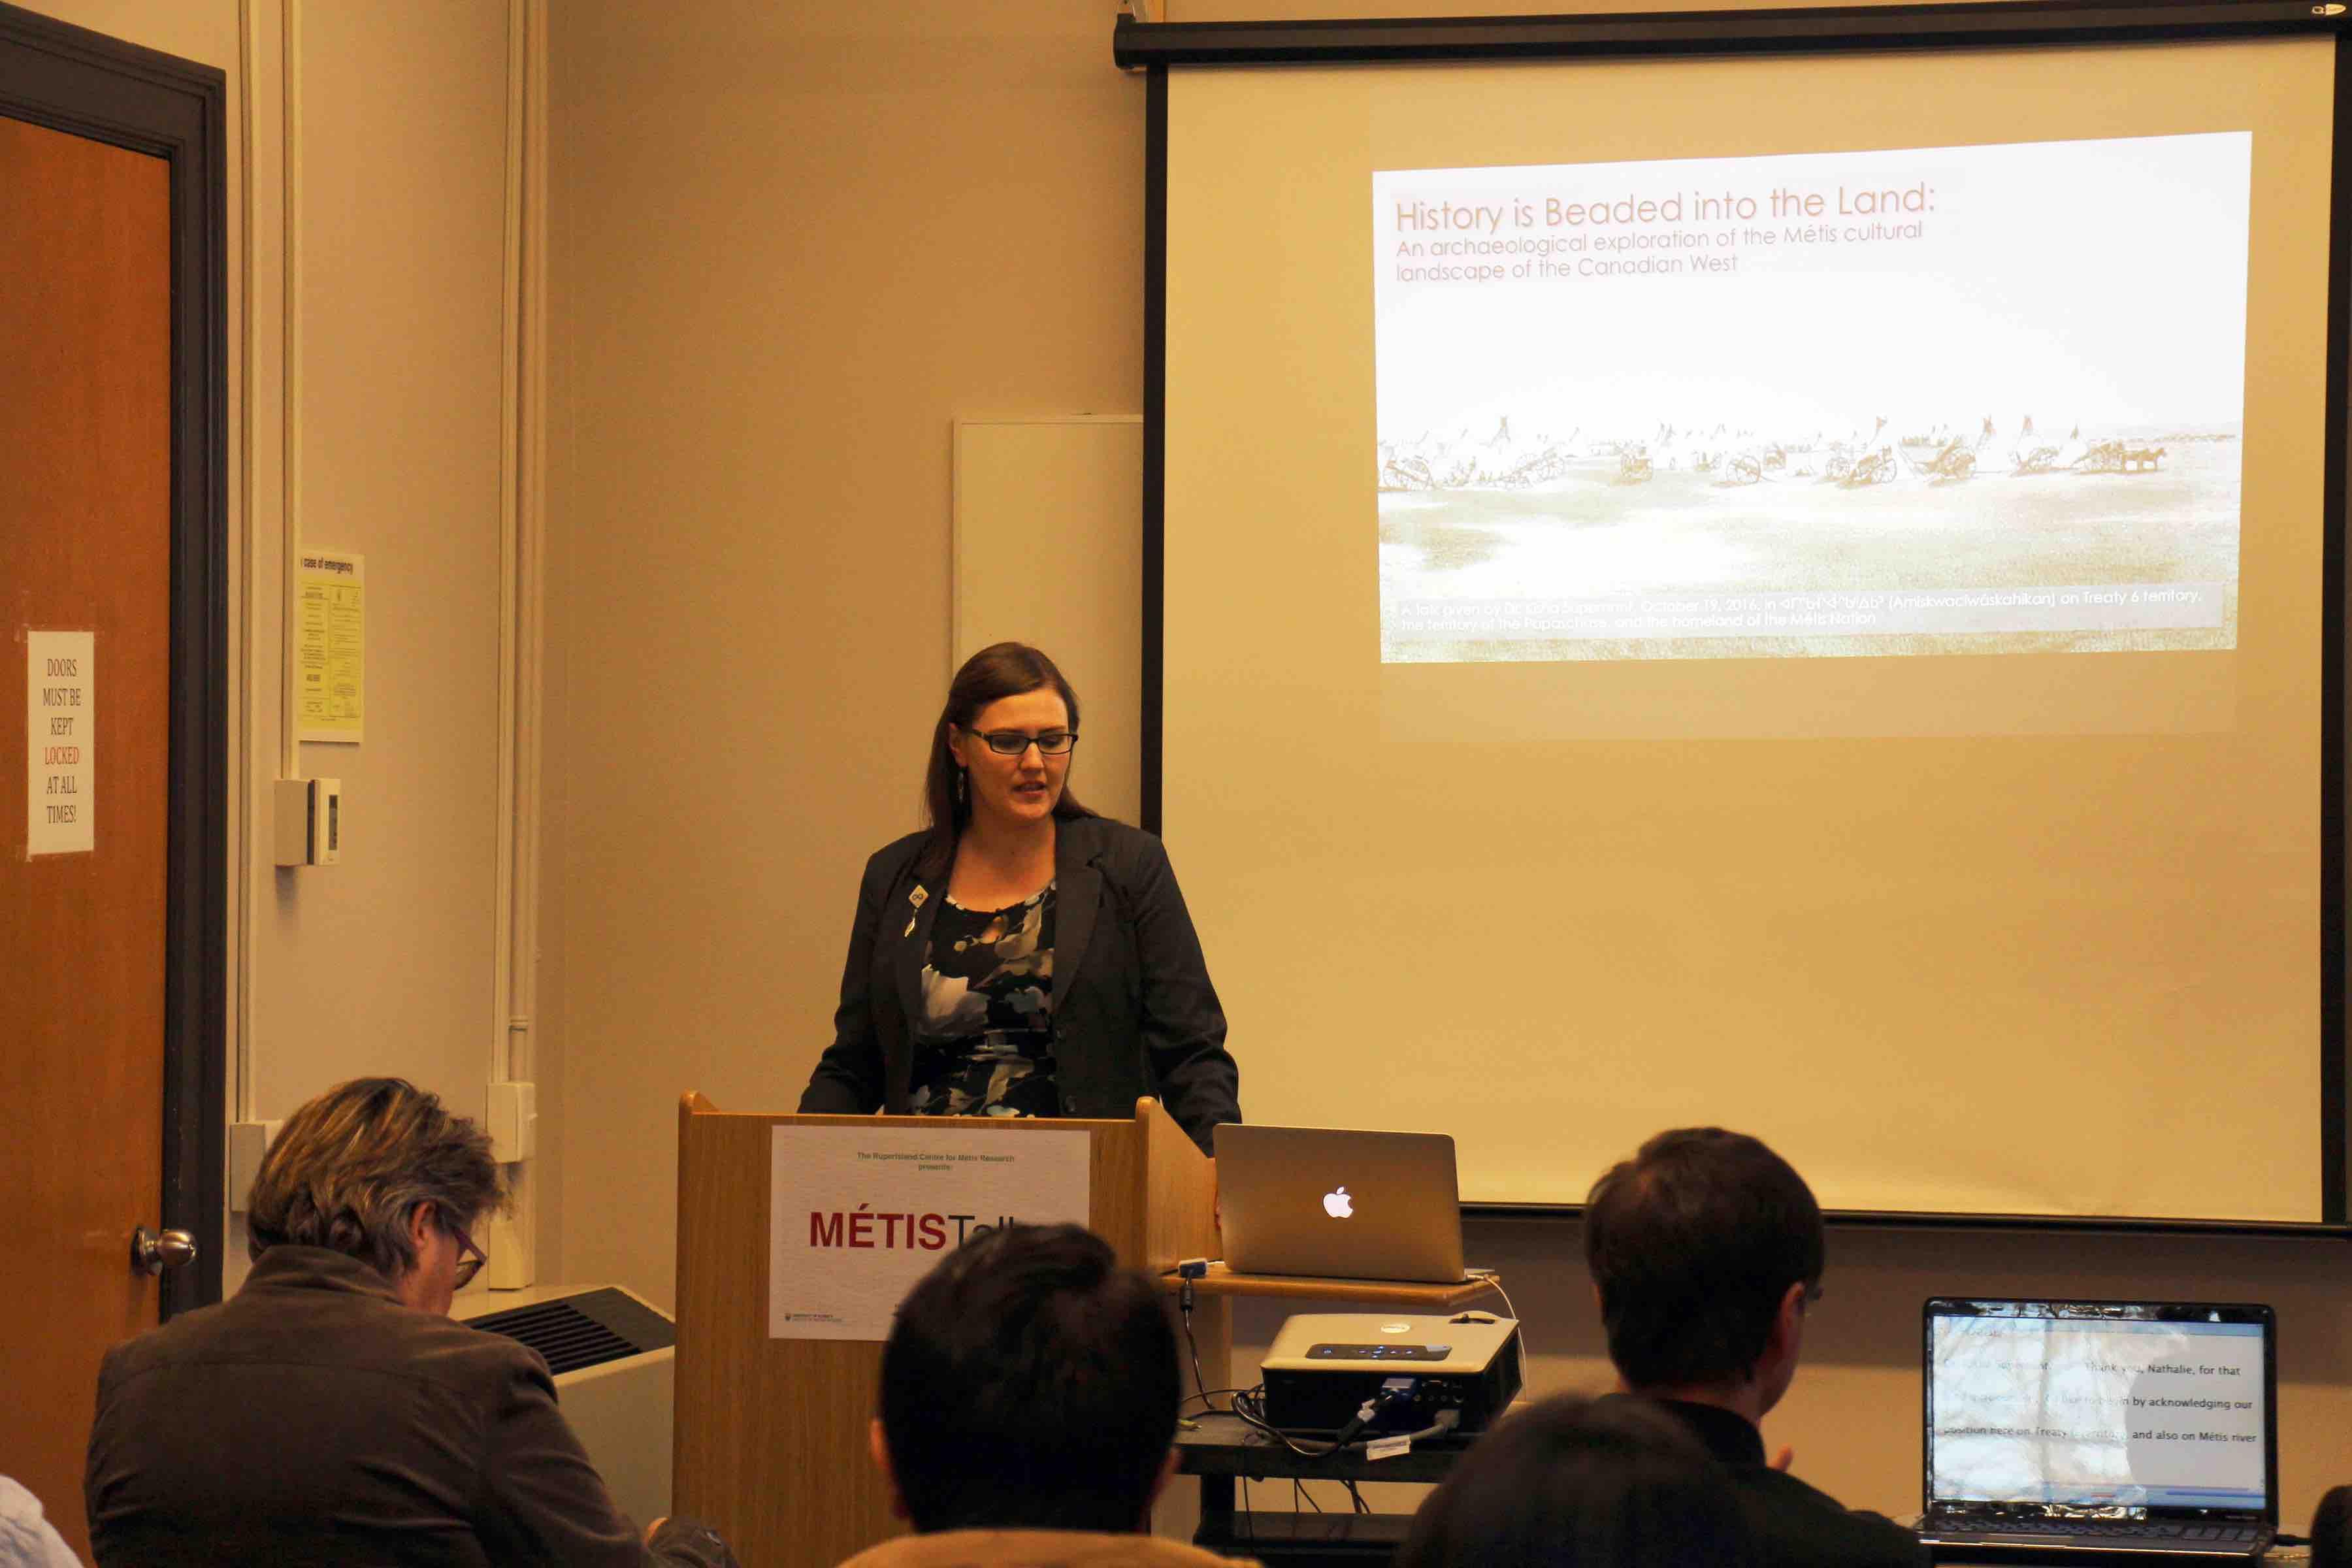 Kisha Supernant presenting